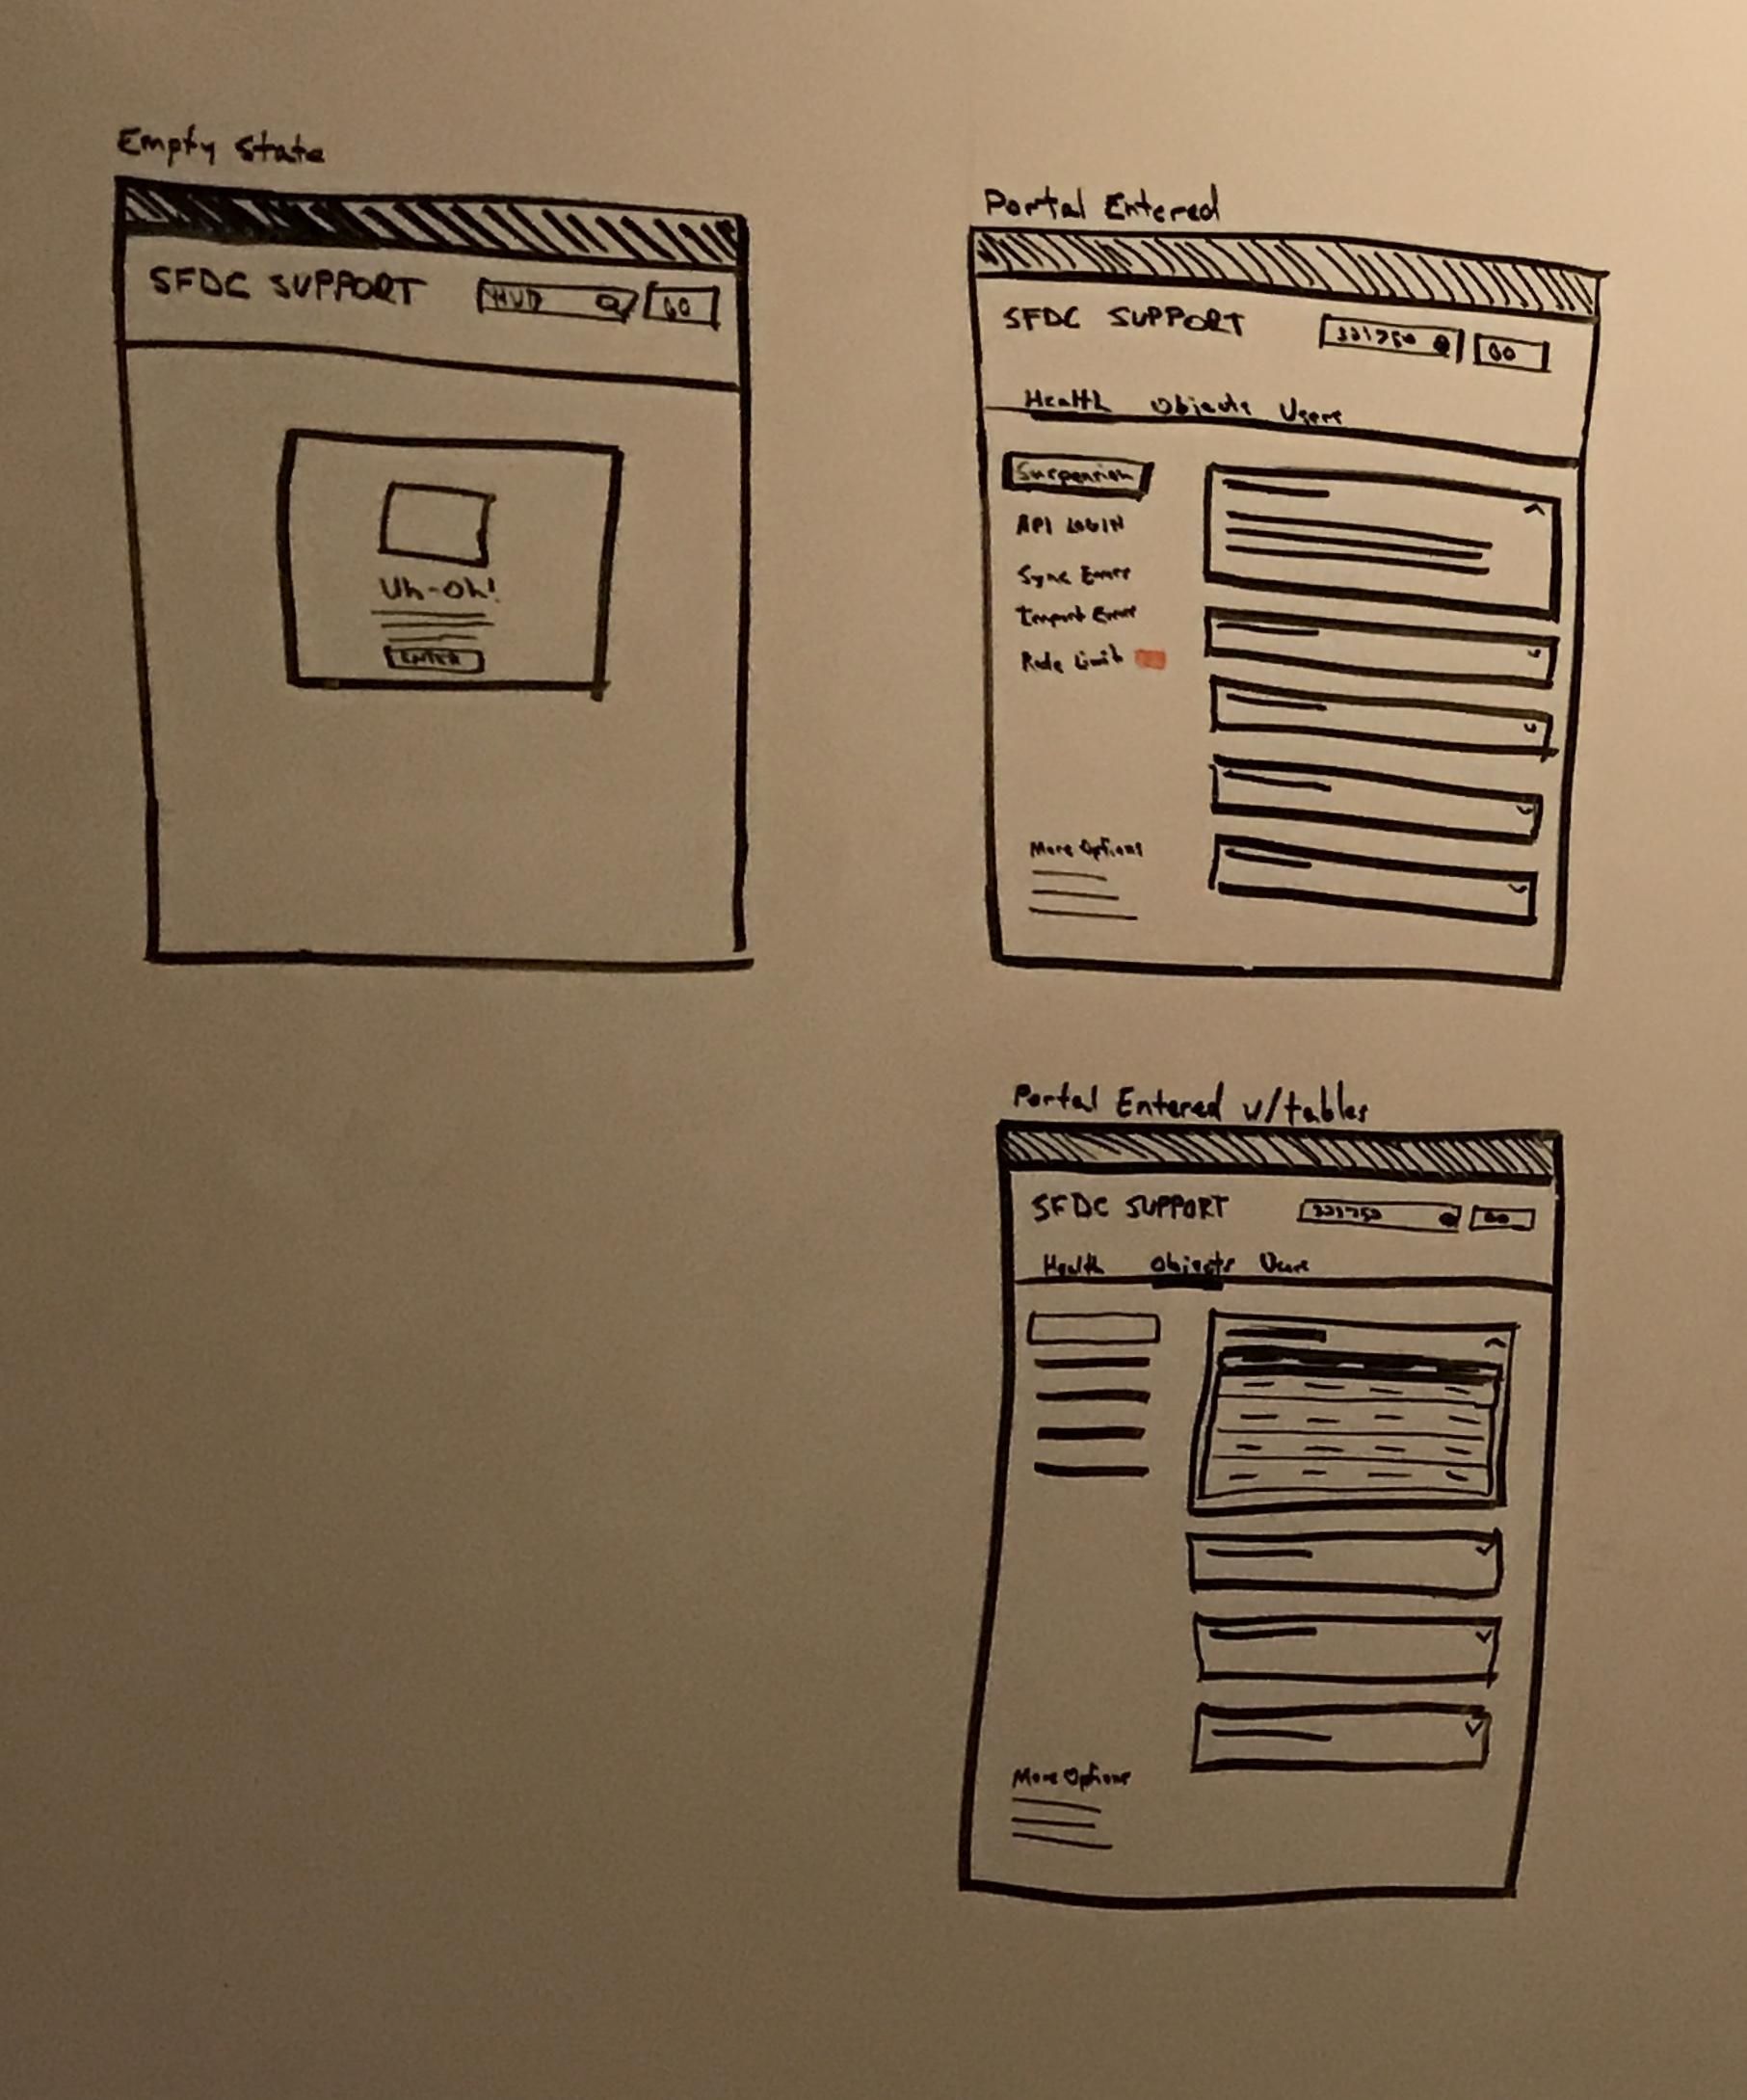 sfdc-console_whiteboard-wireframe.jpeg